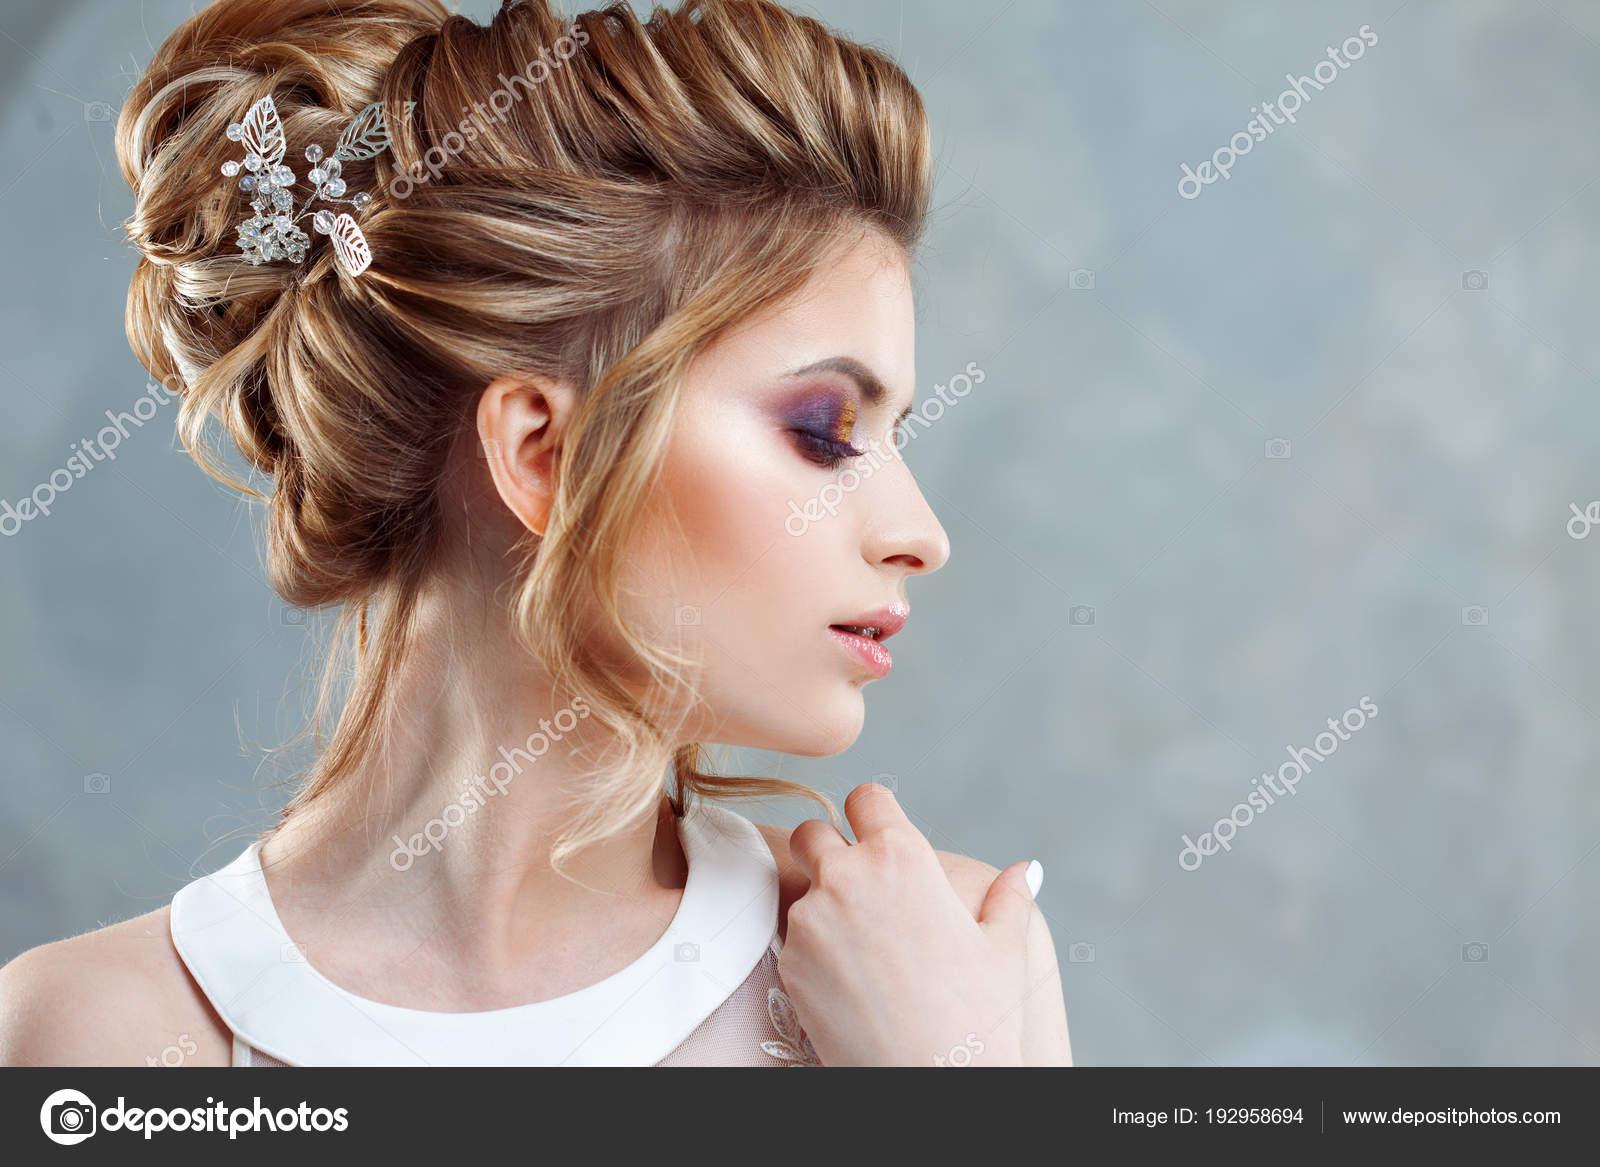 Young Beautiful Bride With An Elegant High Hairdo Wedding